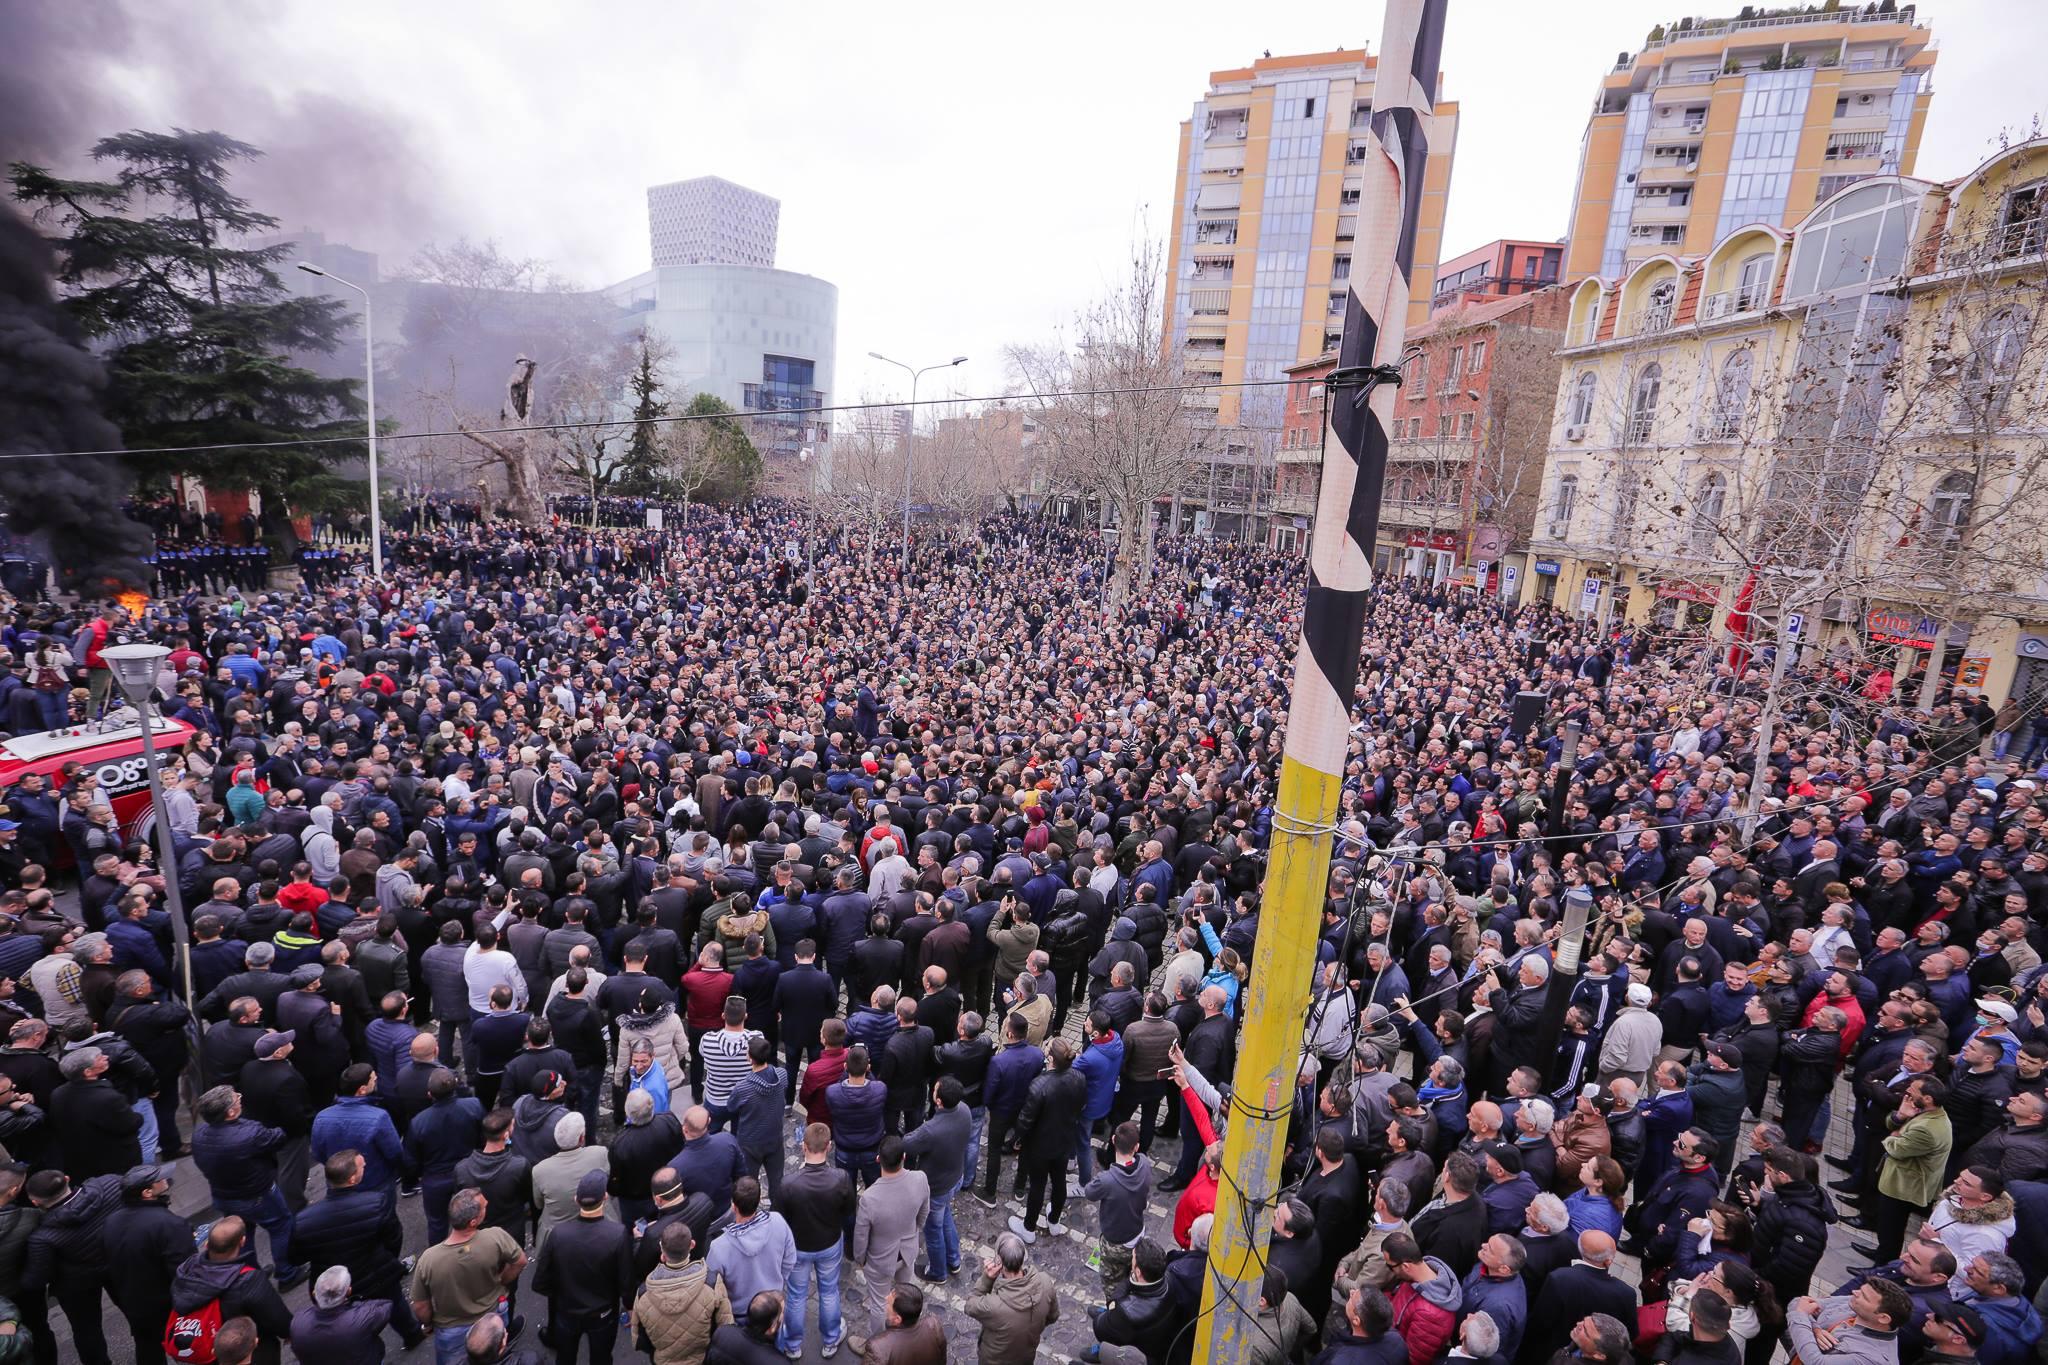 Opozita proteston me djegie gomash e me shashka: Rama ik!